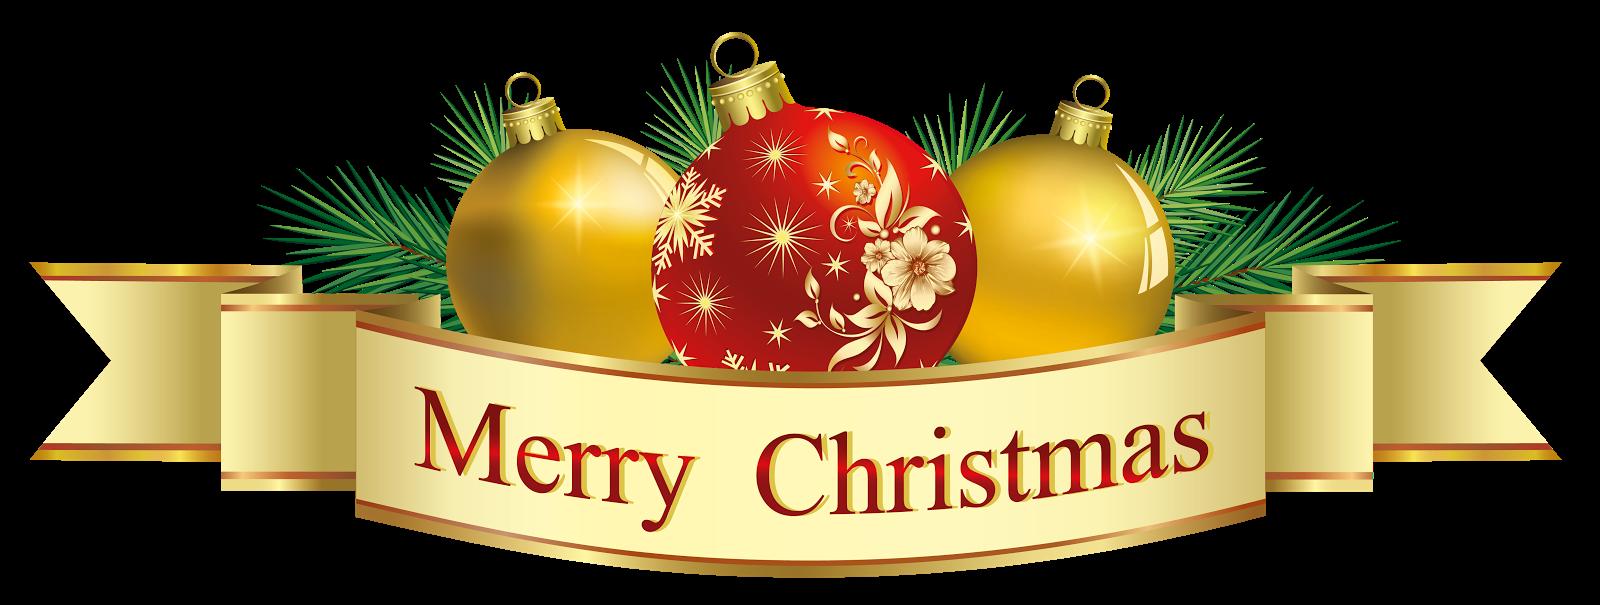 Christmas Clipart Latest 2016-Christmas clipart latest 2016-1